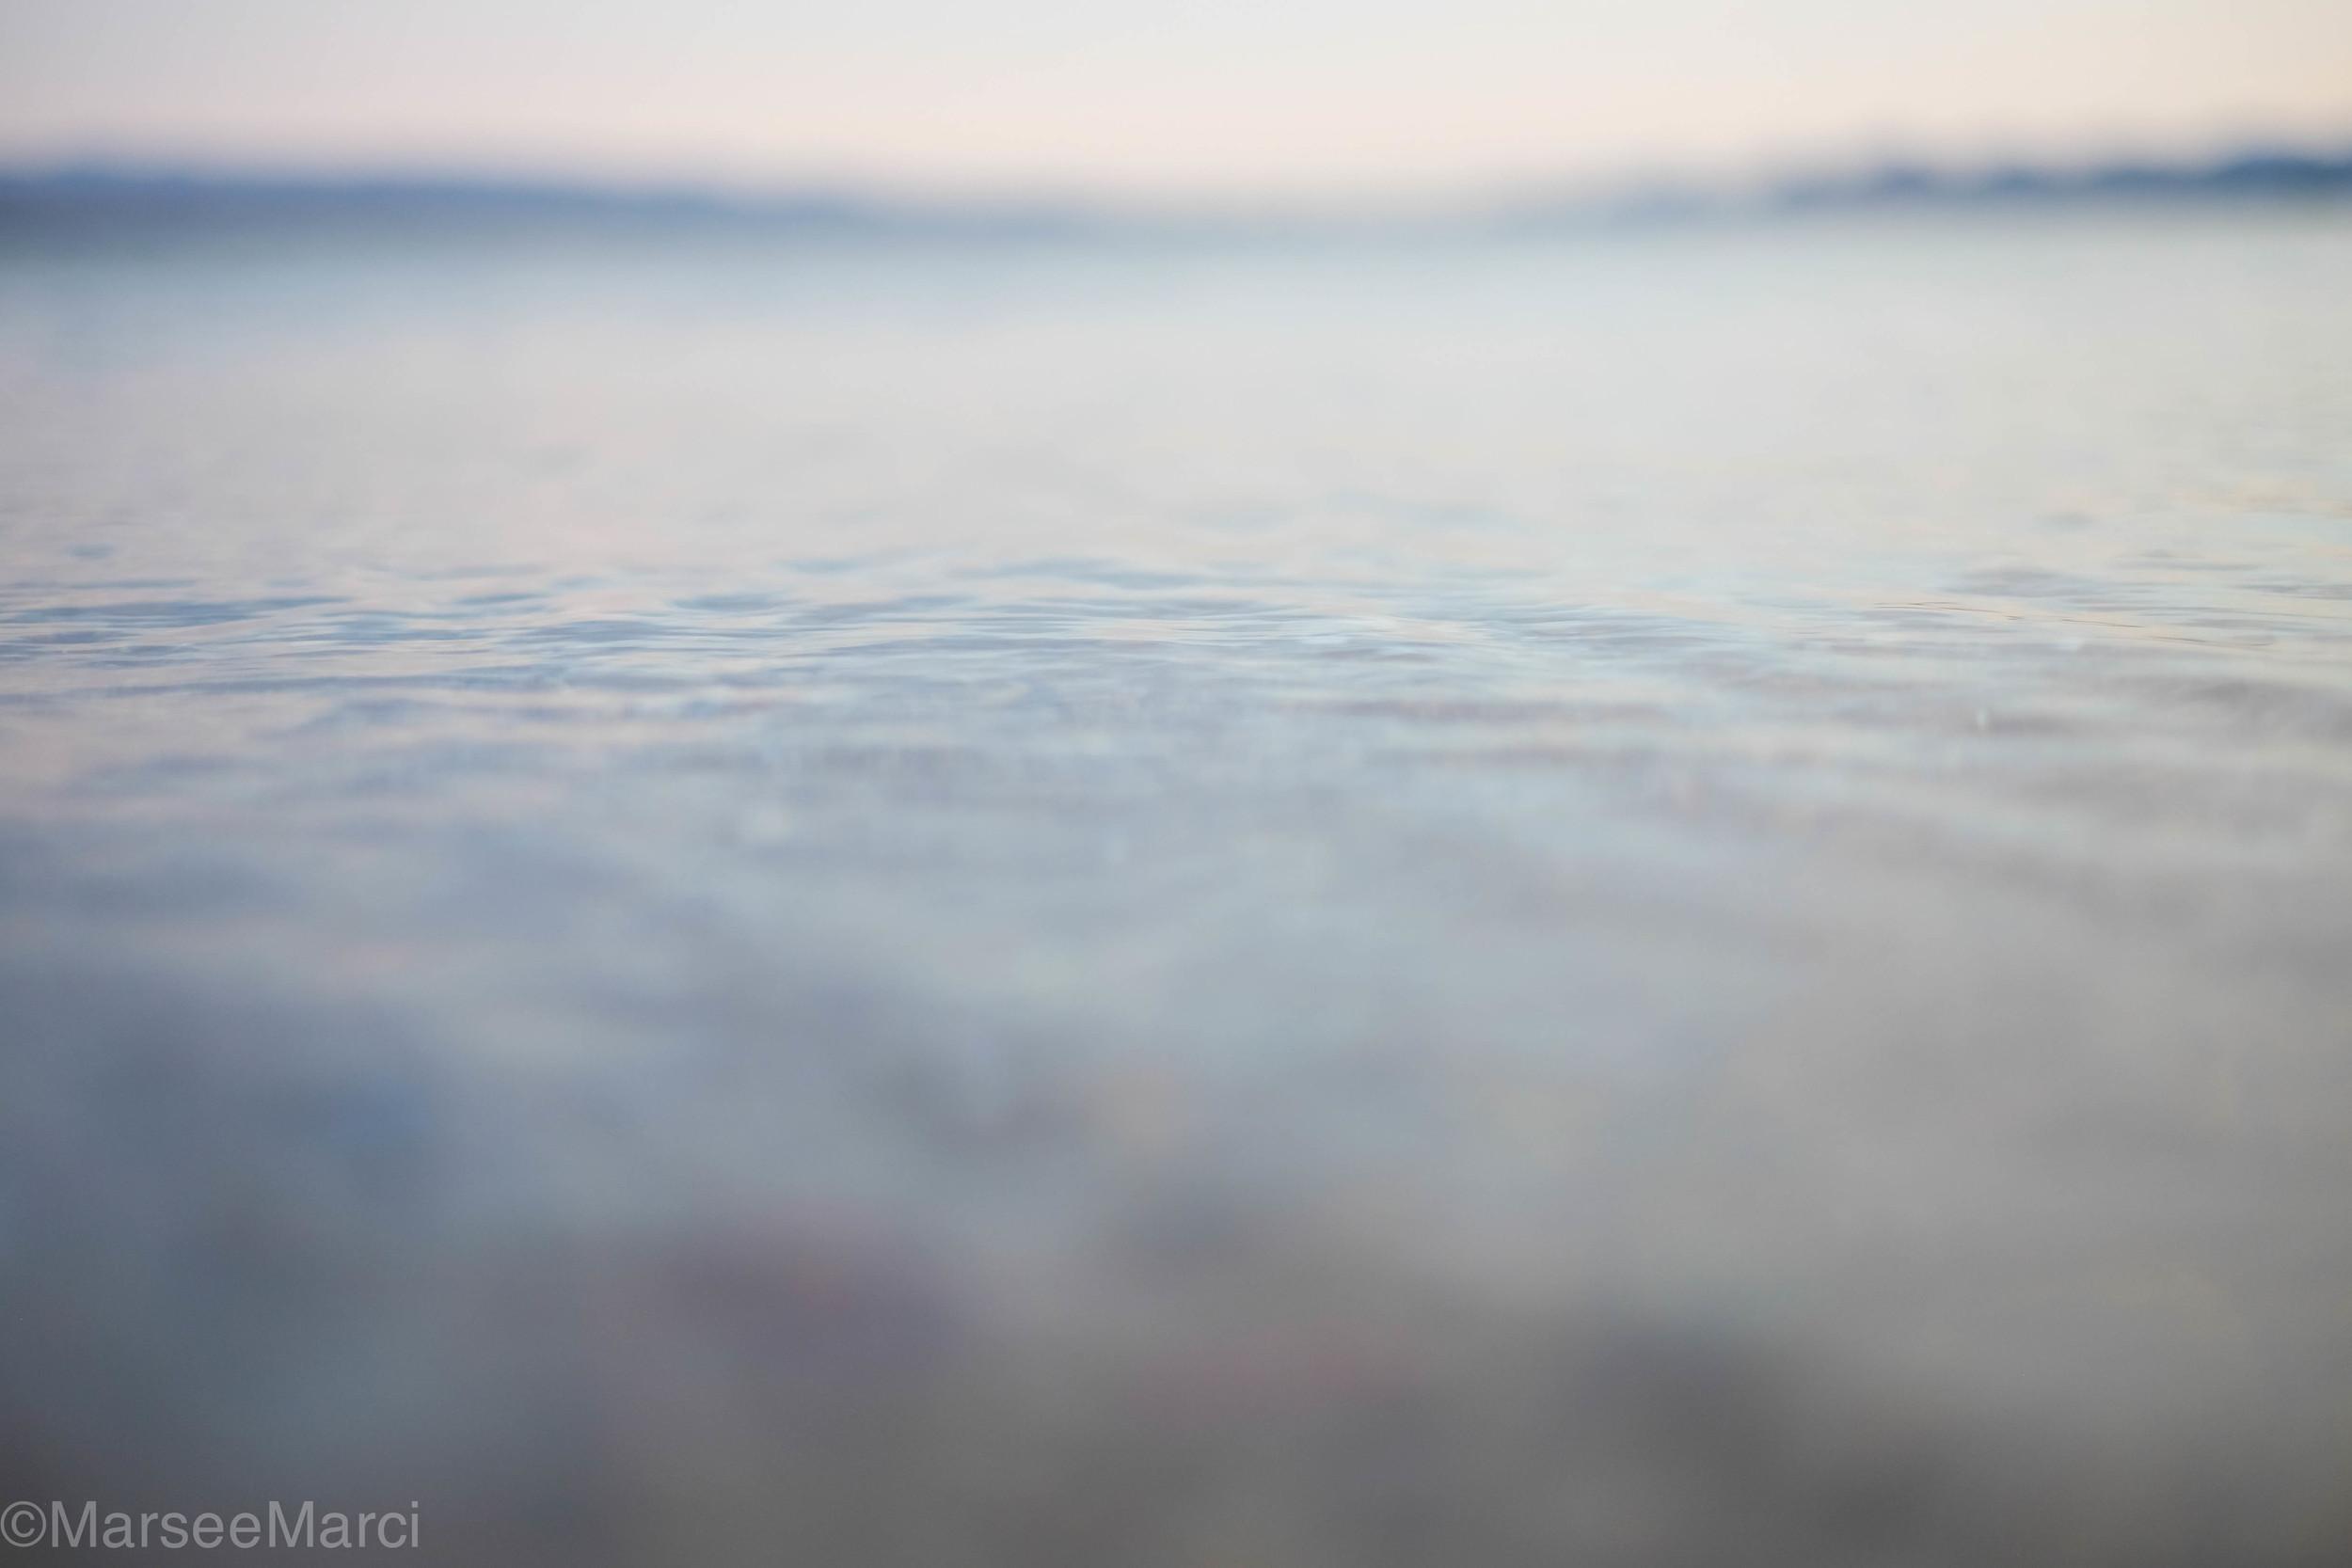 WaterSurface